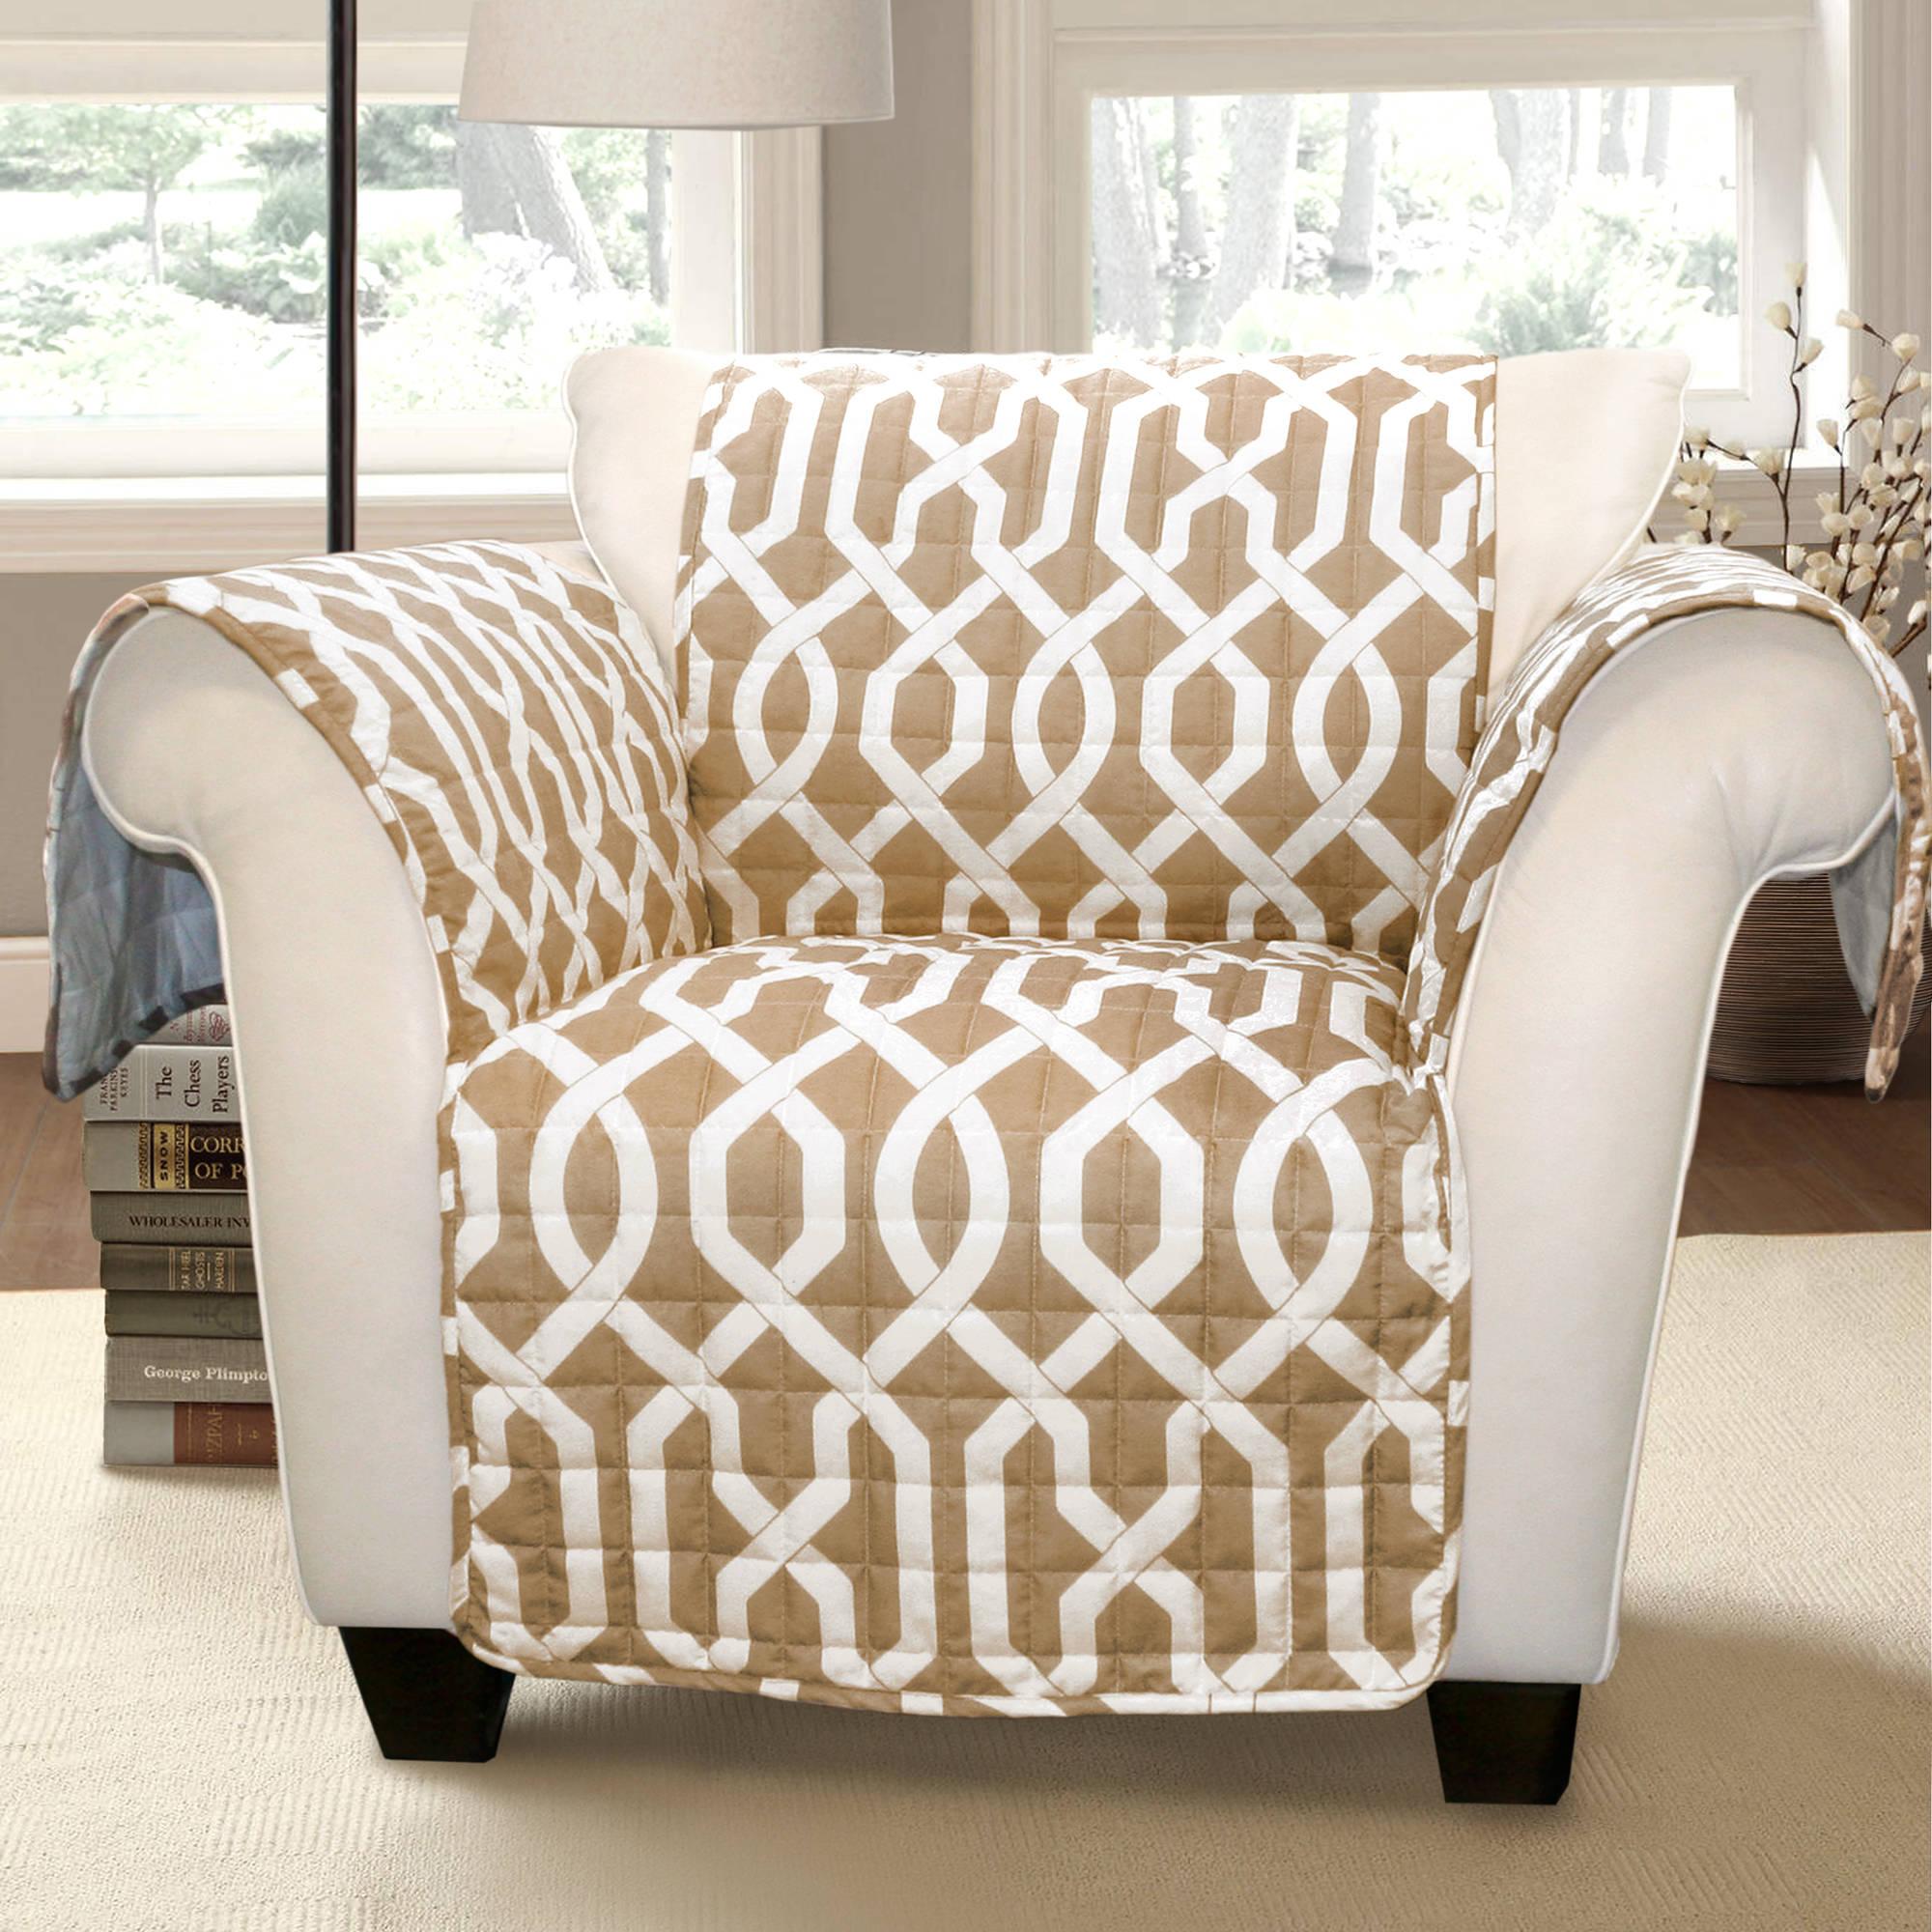 Generic Edward Trellis Furniture Protector, Taupe